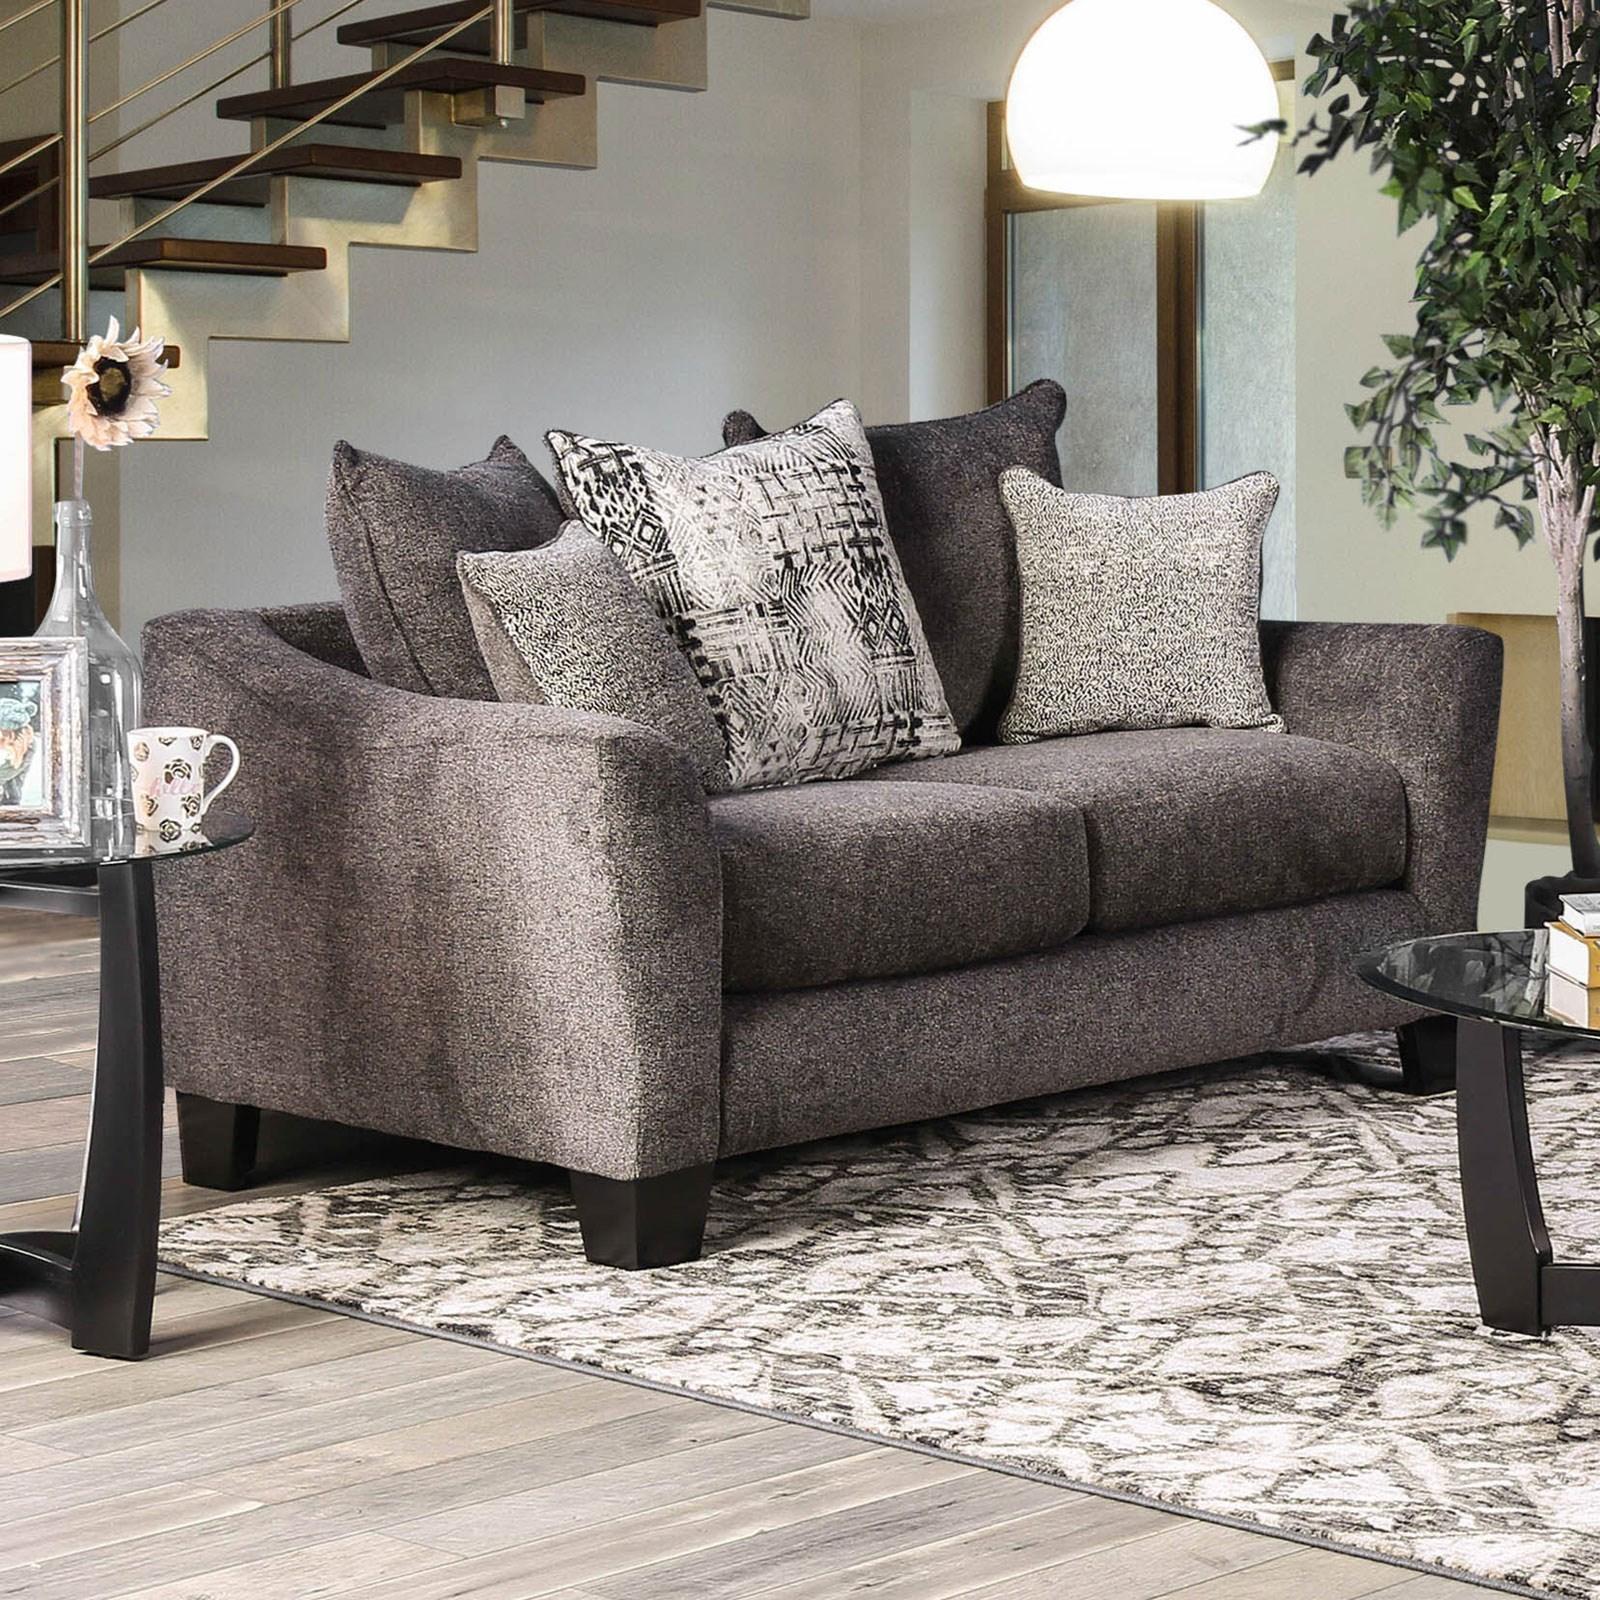 Jena Love Seat by Furniture of America at Nassau Furniture and Mattress